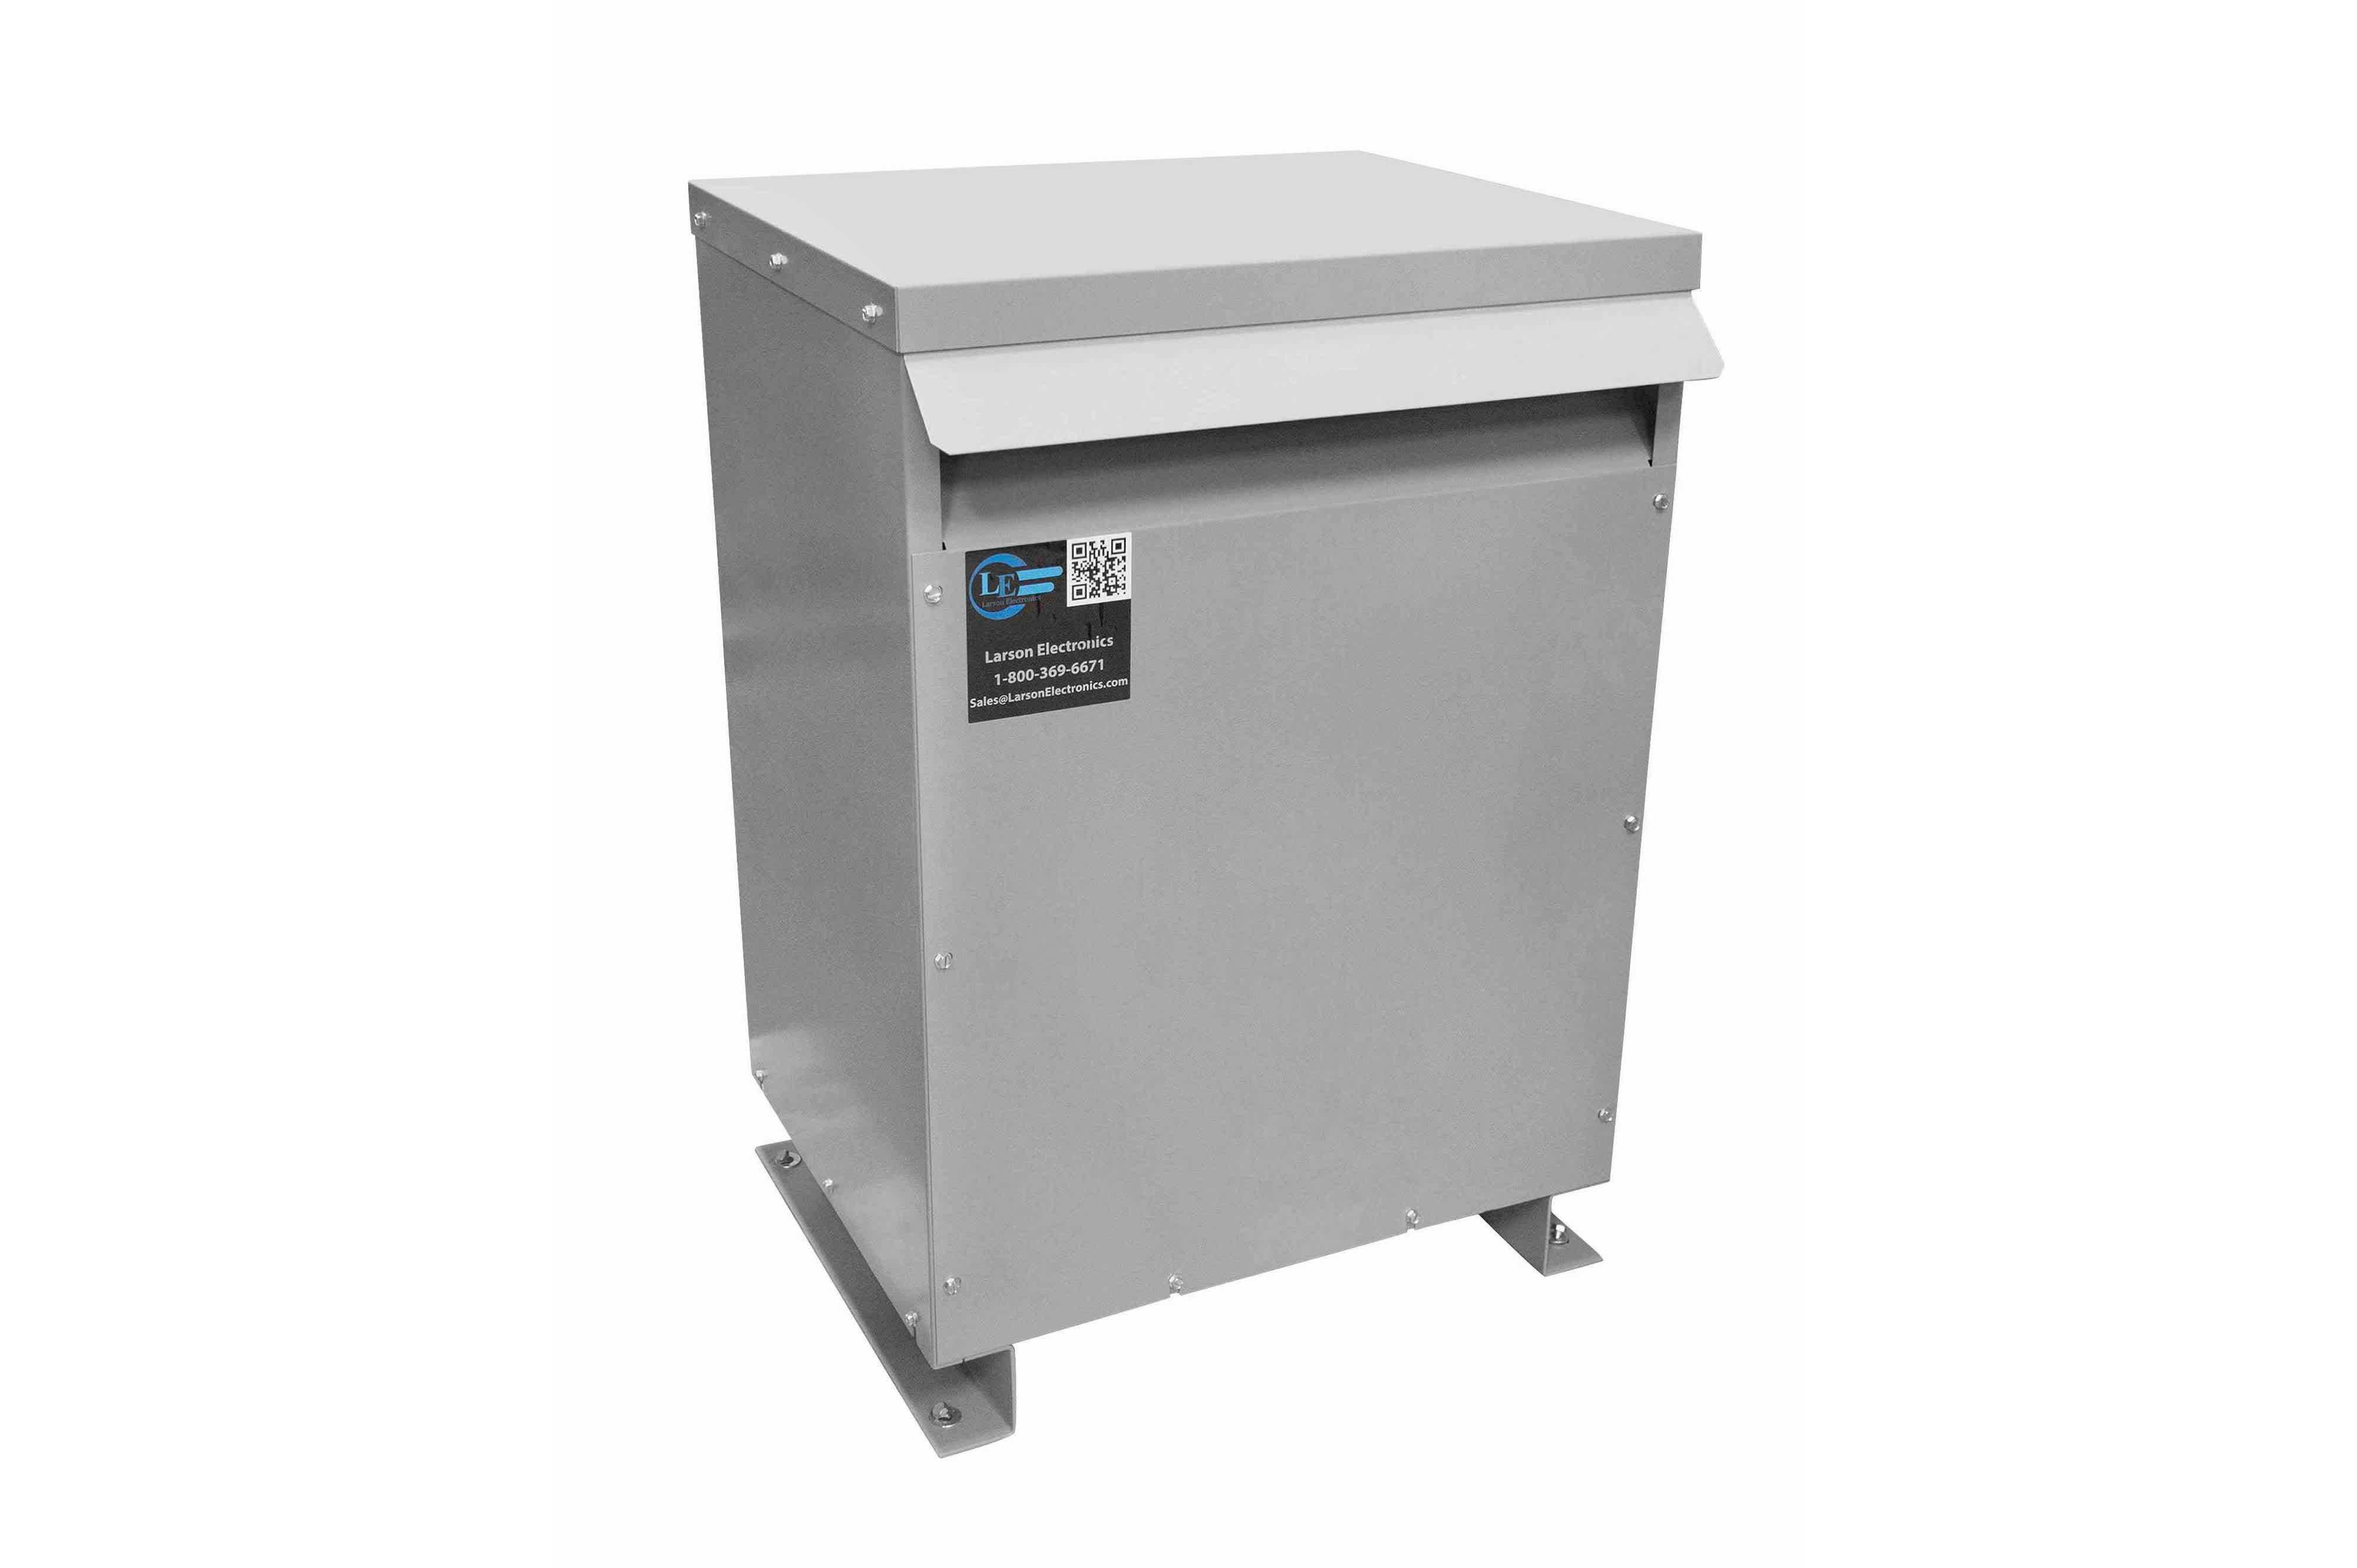 100 kVA 3PH Isolation Transformer, 460V Wye Primary, 380V Delta Secondary, N3R, Ventilated, 60 Hz